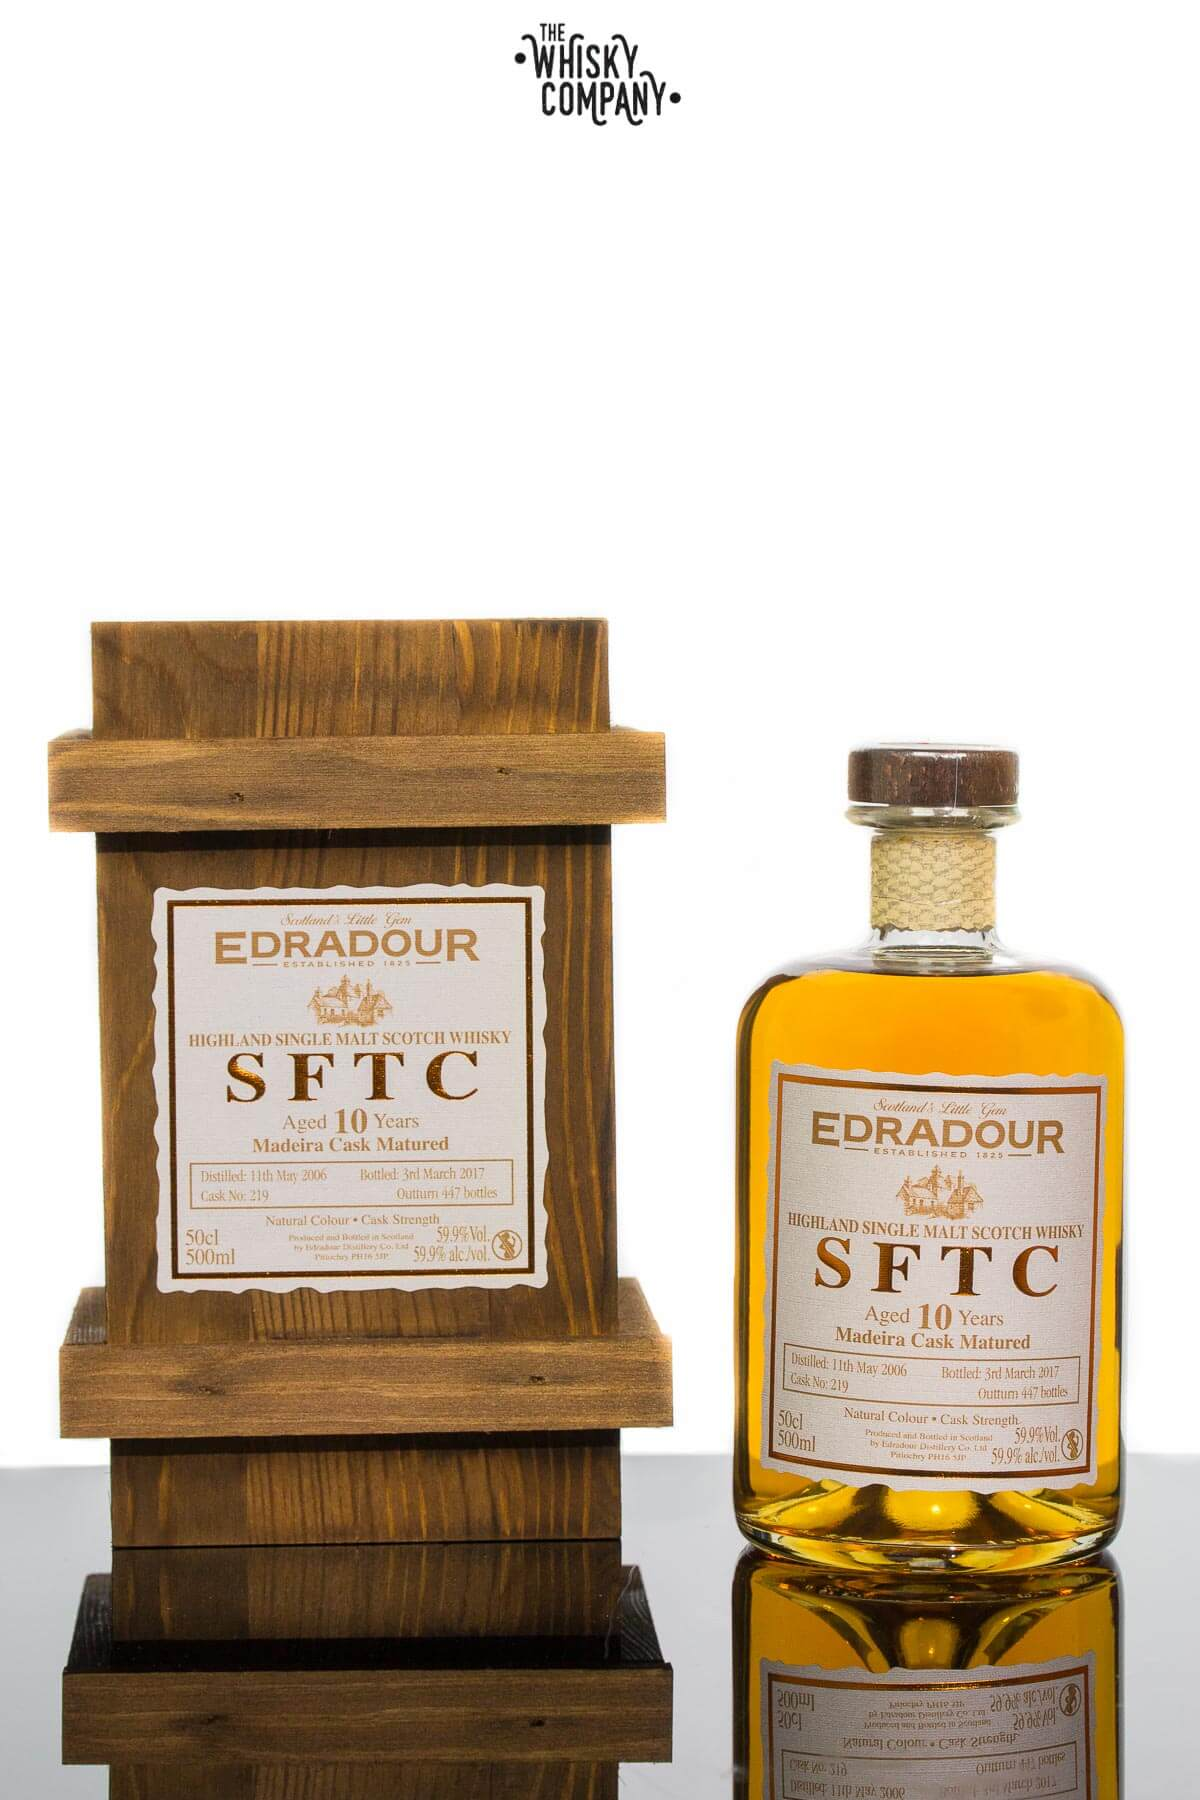 Edradour SFTC Aged 10 Years Madeira Cask Matured Single Malt Scotch Whisky (500ml)